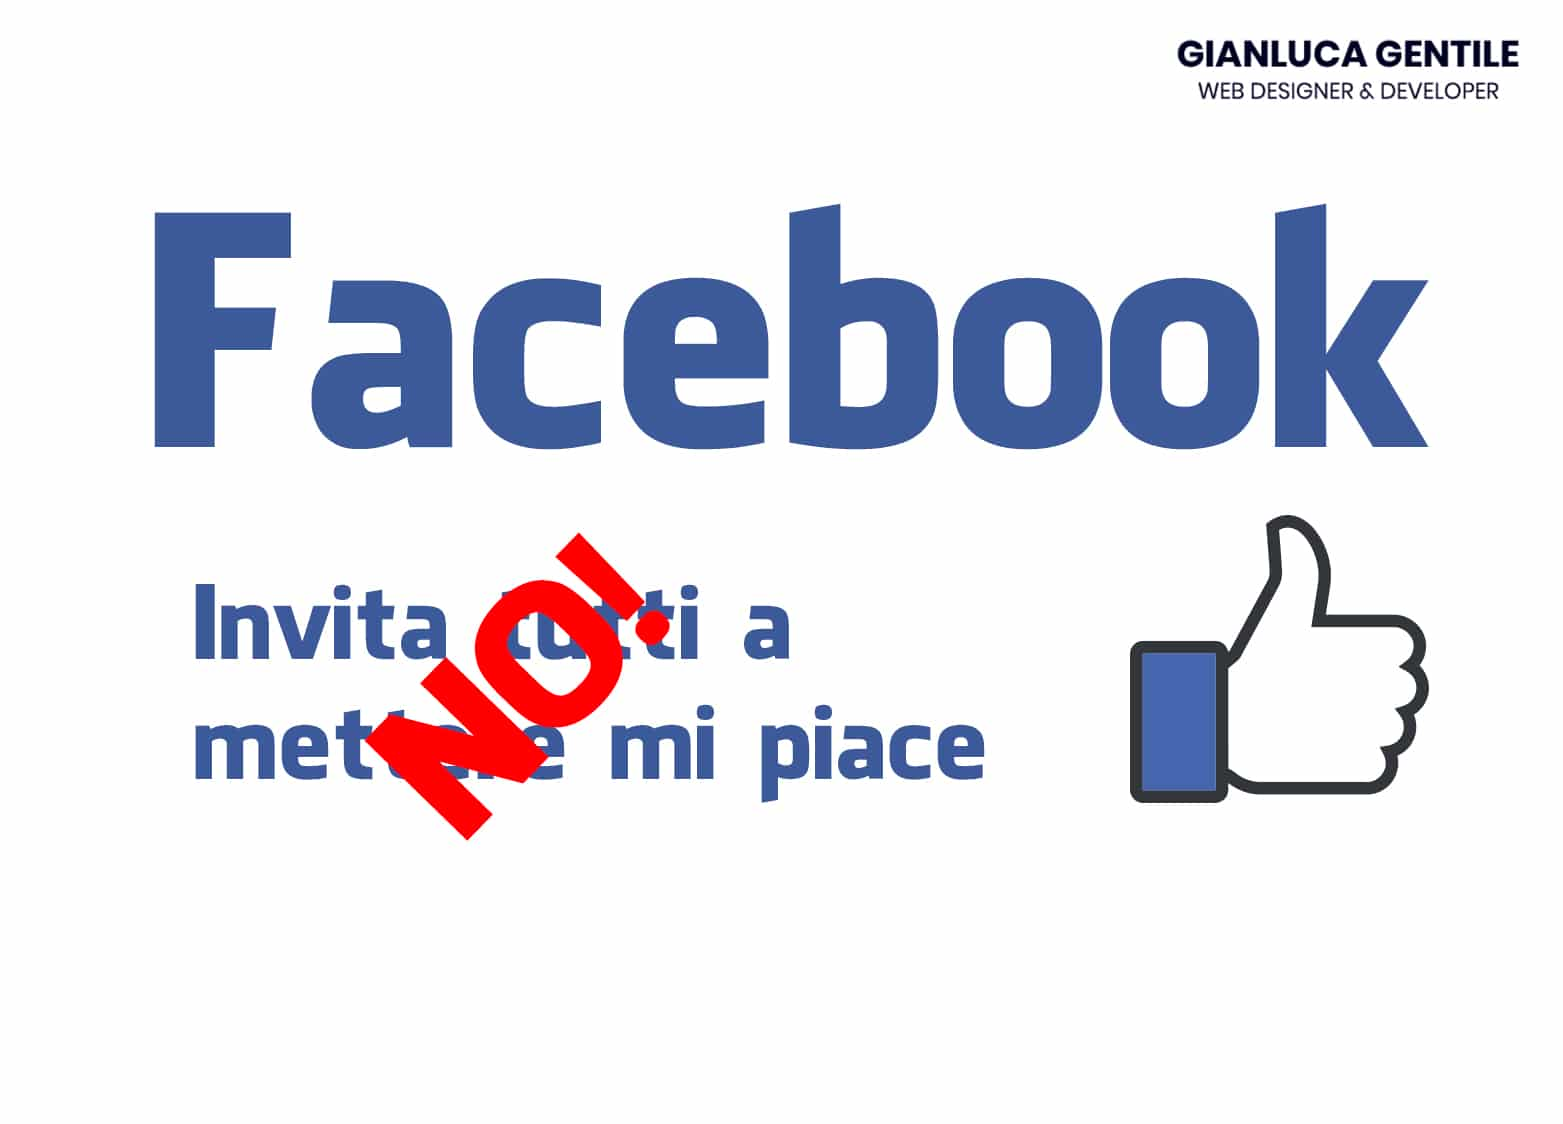 fan pagina facebook - Fan pagina Facebook basta a inviti random - Fan pagina Facebook, basta a inviti random